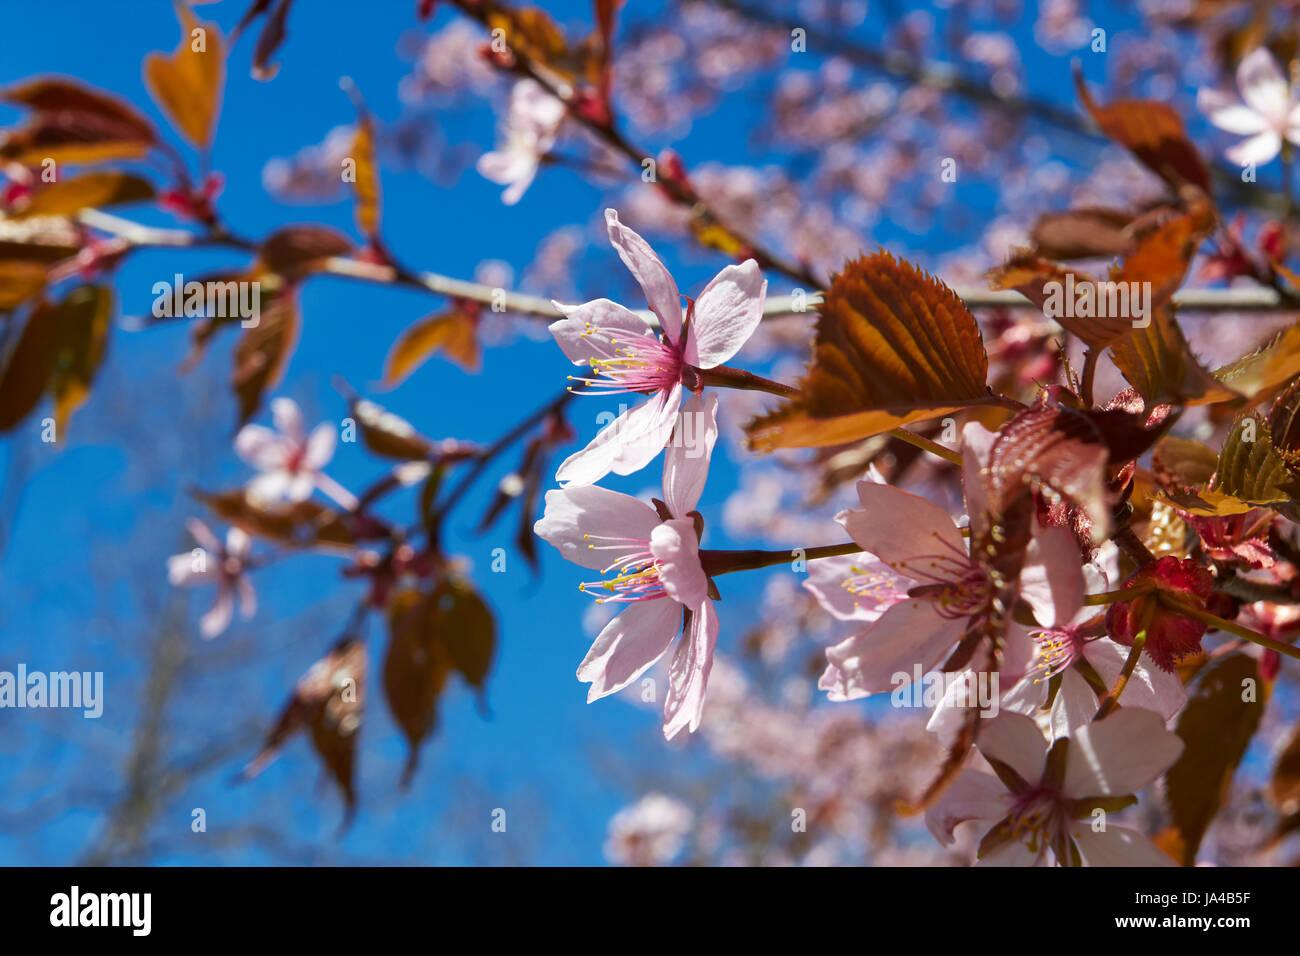 Prunus sargentii, Sargents cherry tree blossom, Finland Europe Stock Photo